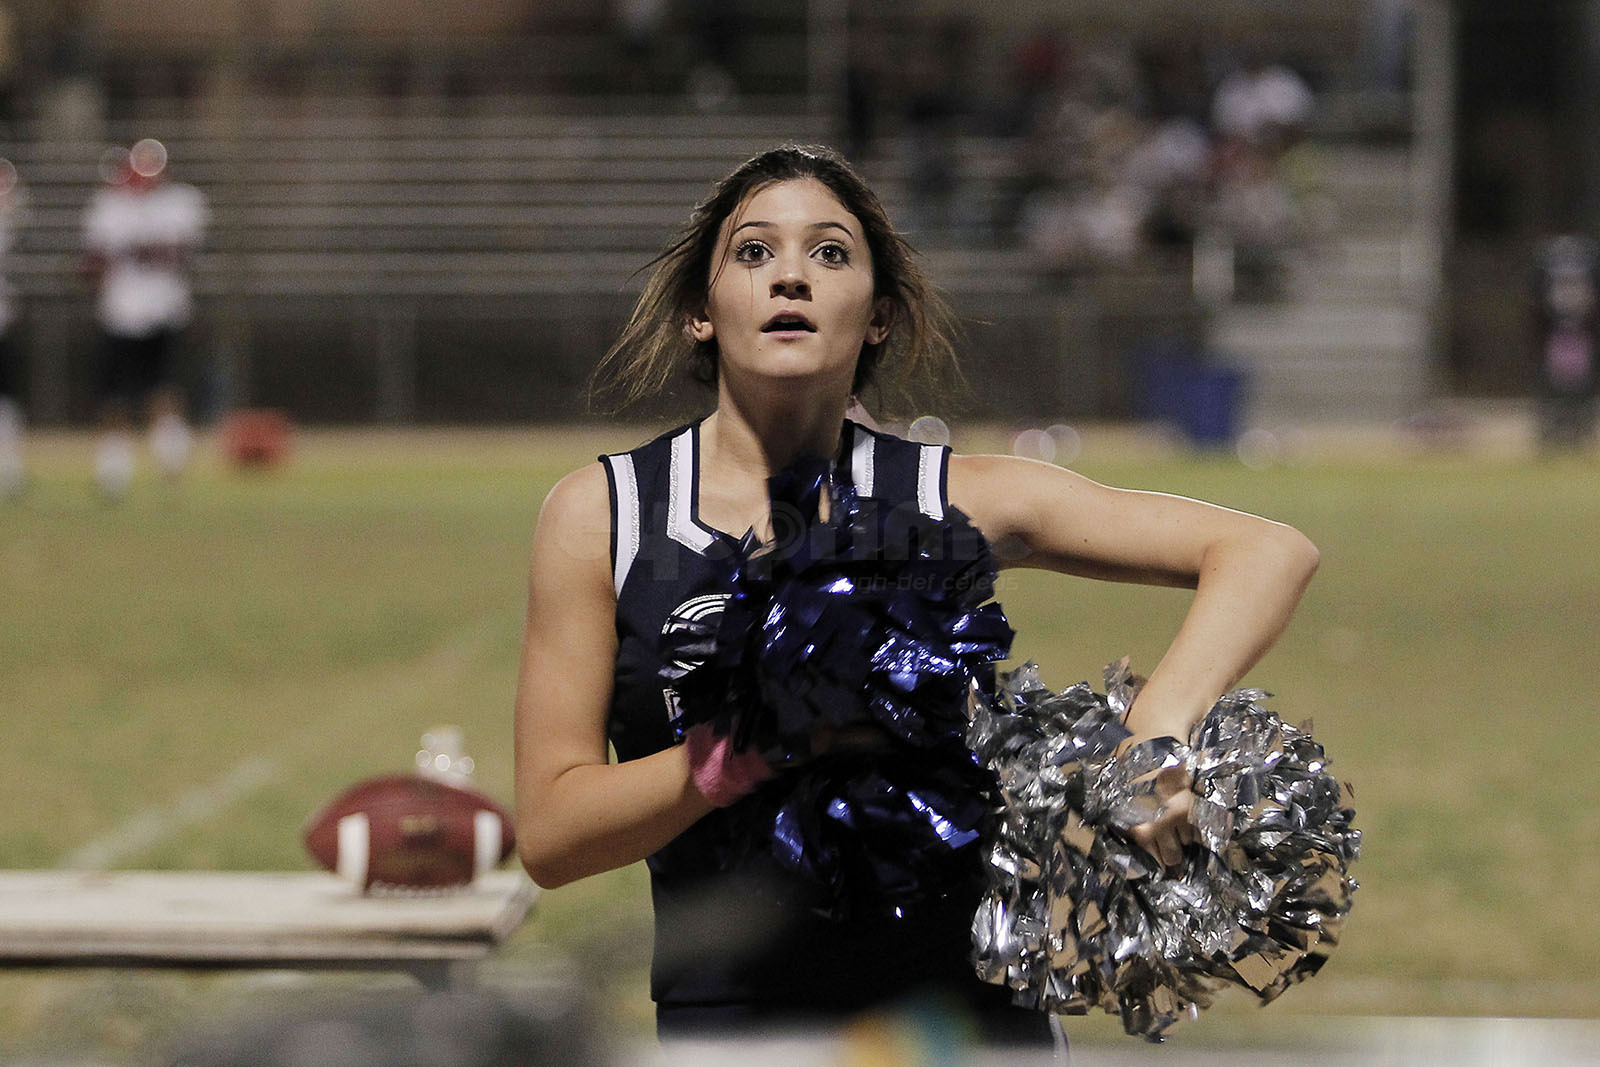 Image result for kylie jenner cheerleader